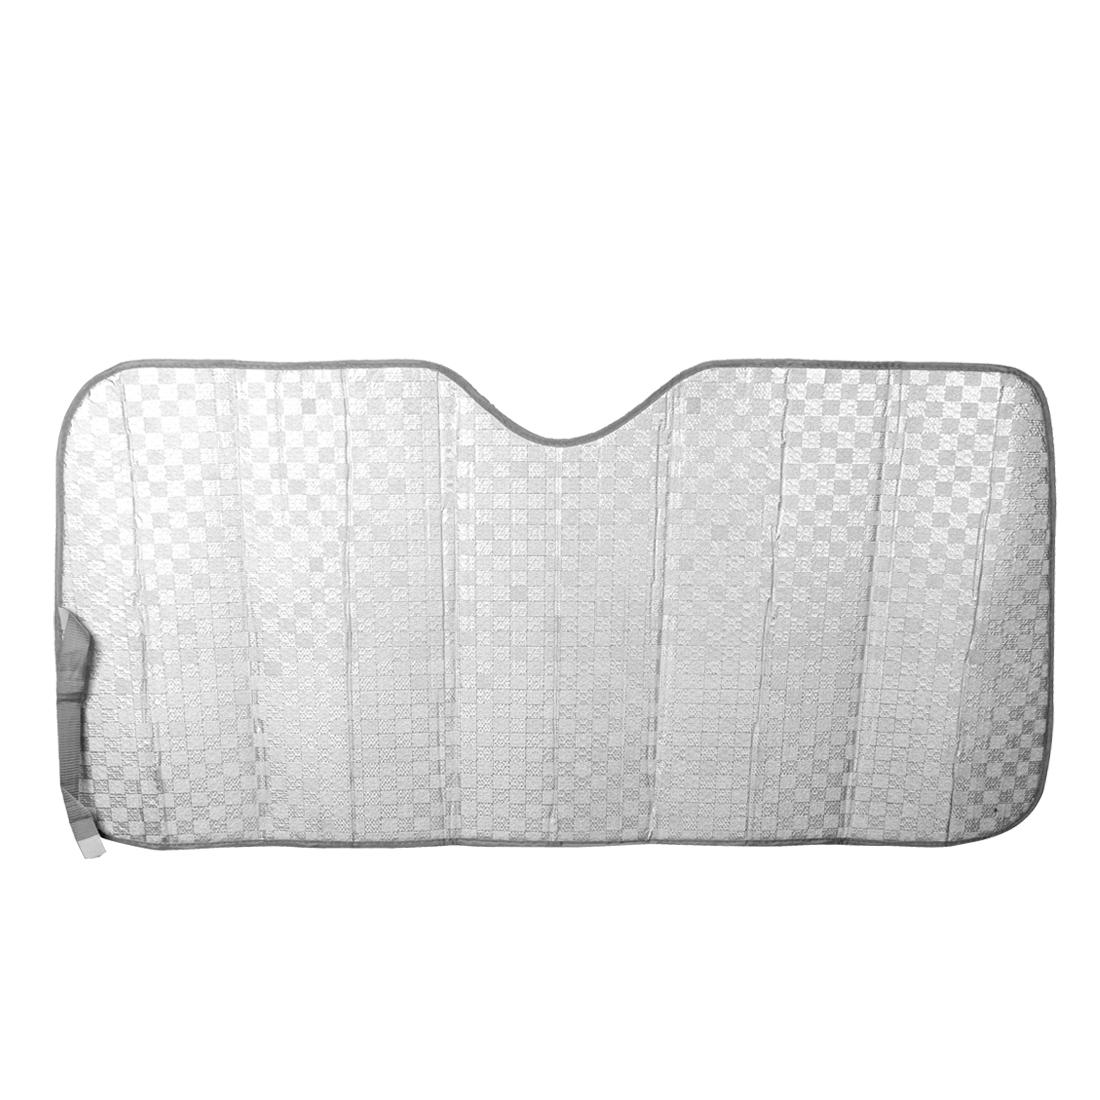 Universal Foldable Auto Car Front Rear Sun Shade Window Windshield Visor Cover 142 x 68cm